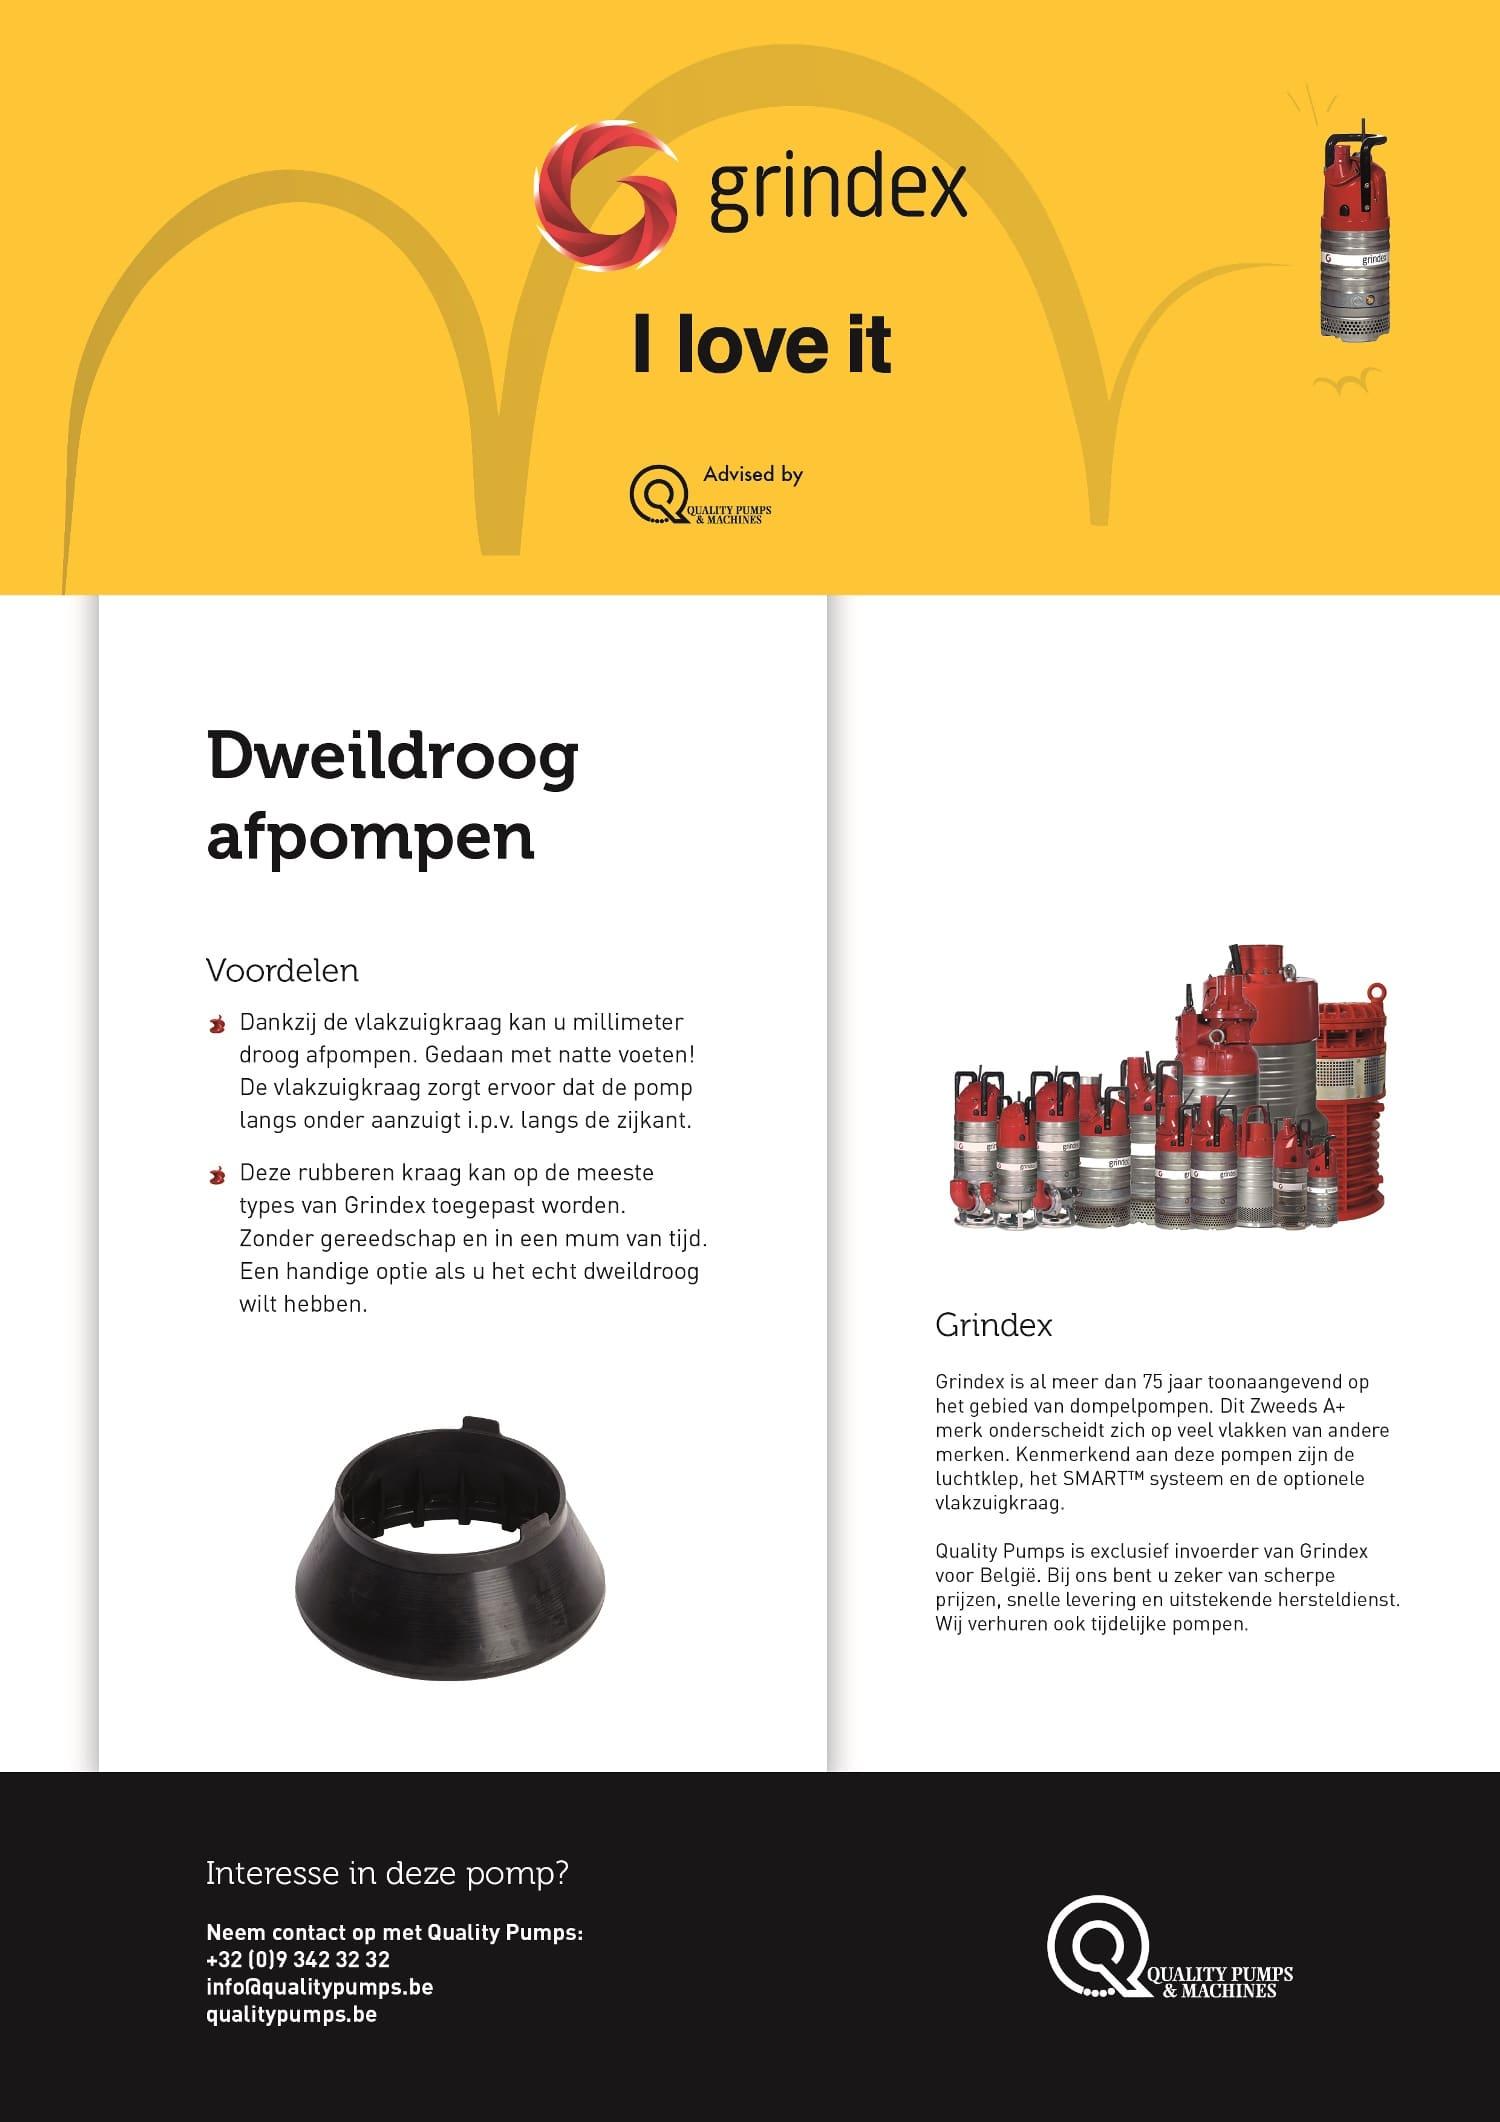 QualityPumps_Grindex_Dweildroog_03_NL-min